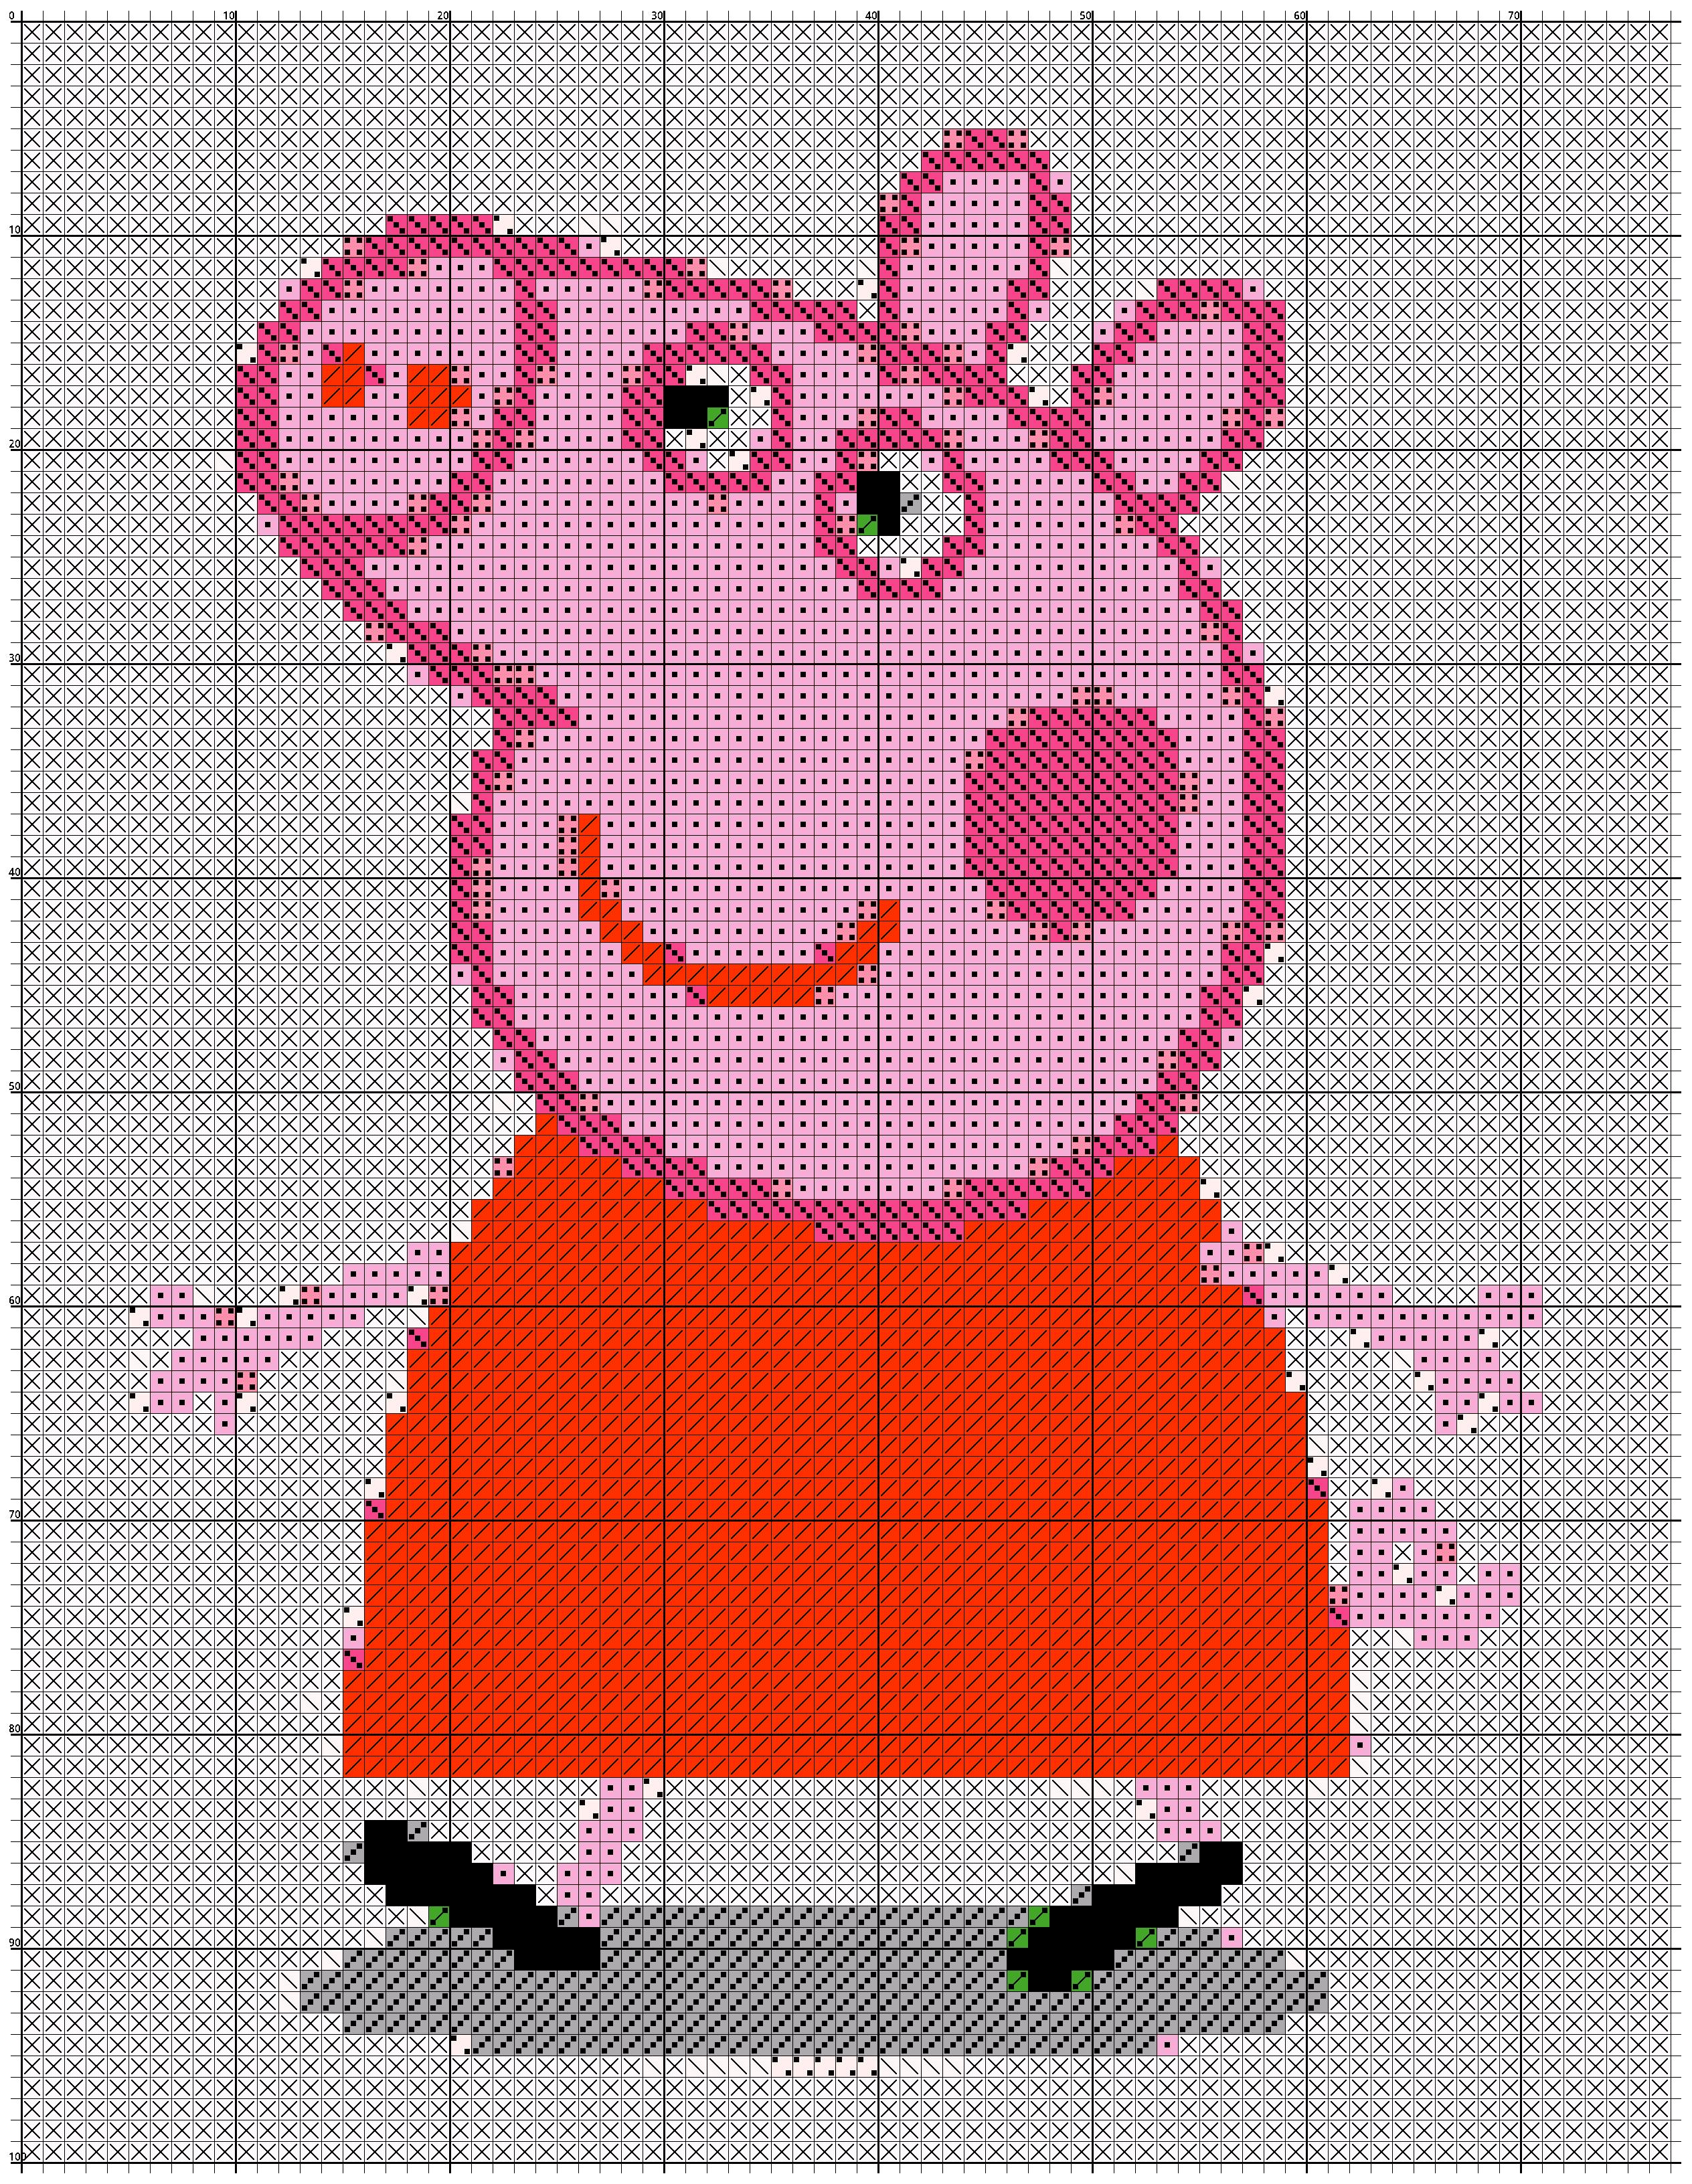 Tutorial Peppa Pig Amigurumi | How to crochet Peppa Pig Amigurumi ... | 3264x2528